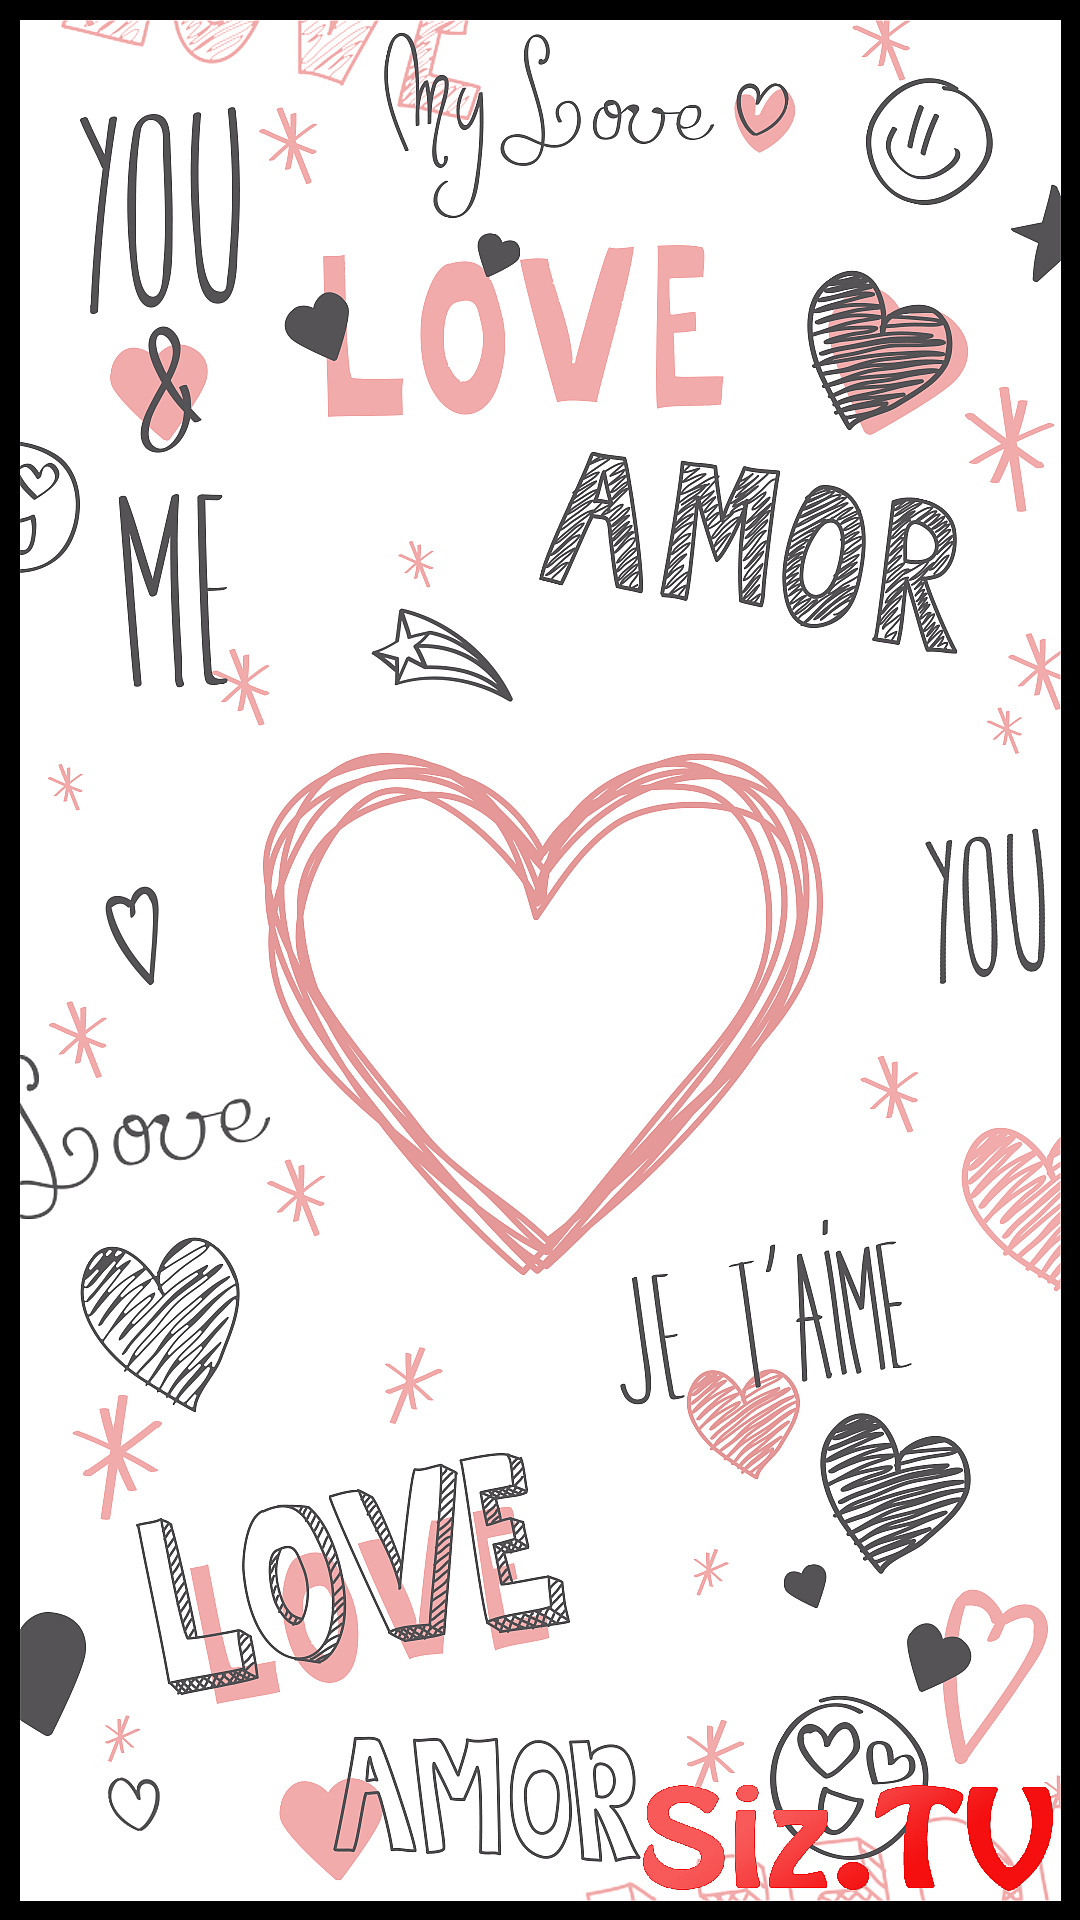 Wallpaper Dia Dos Namorados 2 By Gocase   Wallpaper Dia Dos Namorados 2 By Gocase Coração Hearts Rosa Notebook Je T Aime Love You Me My Love Amor Loving Valentines Namorados Beijo Casal Couple Dia Dos Namorados Valentines Day Romântico Paixão Rosa Cute Girly Wallpaper Papel De Parede Fundo De Tela Background Estrela #wallpapercelularcasal #wallpaper #namorados #gocase #coração #hearts #rosa #notebook #aime #love #amor #loving #valentines #beijo #casal #couple #romântico #paixão #cute